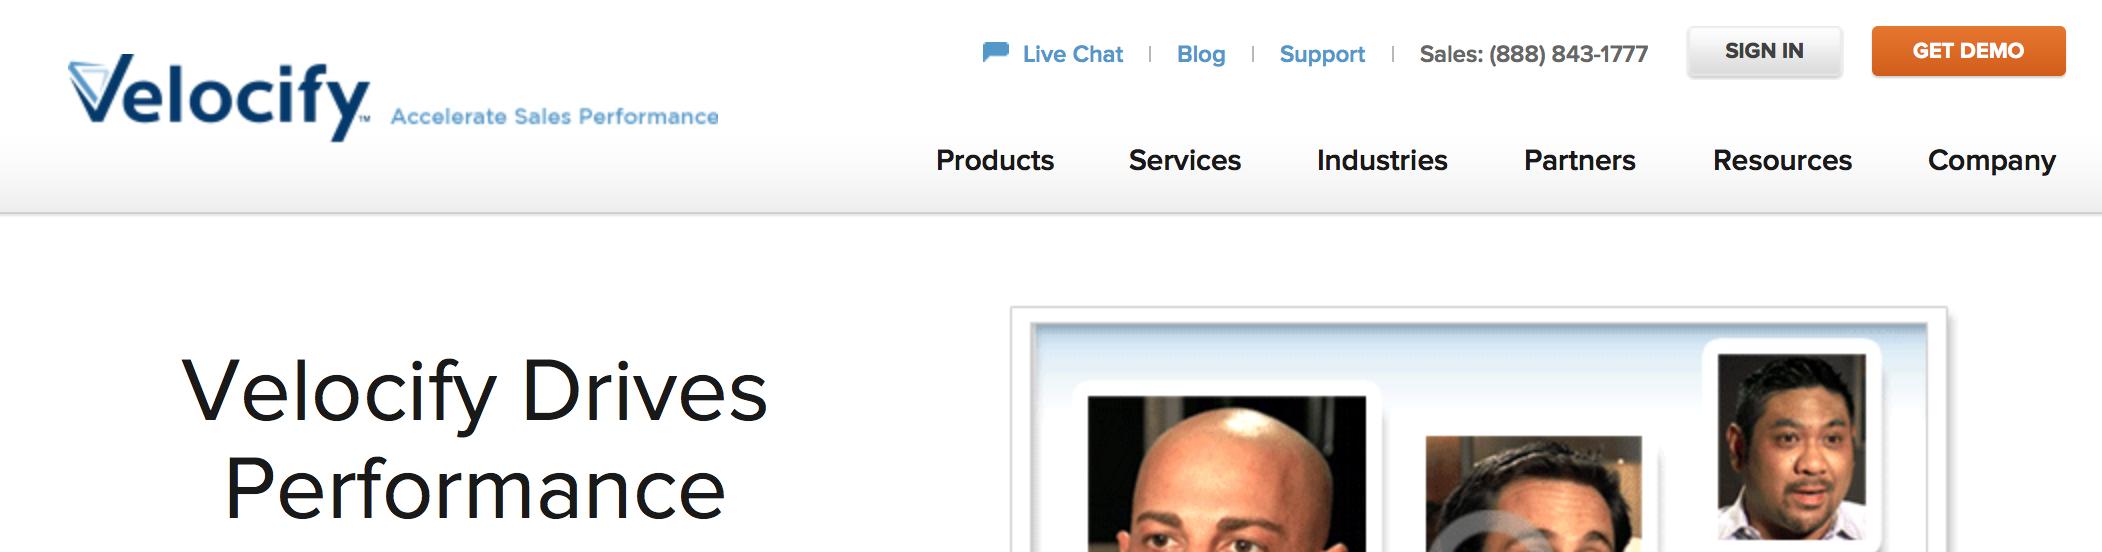 homepage screenshot of velocify.com